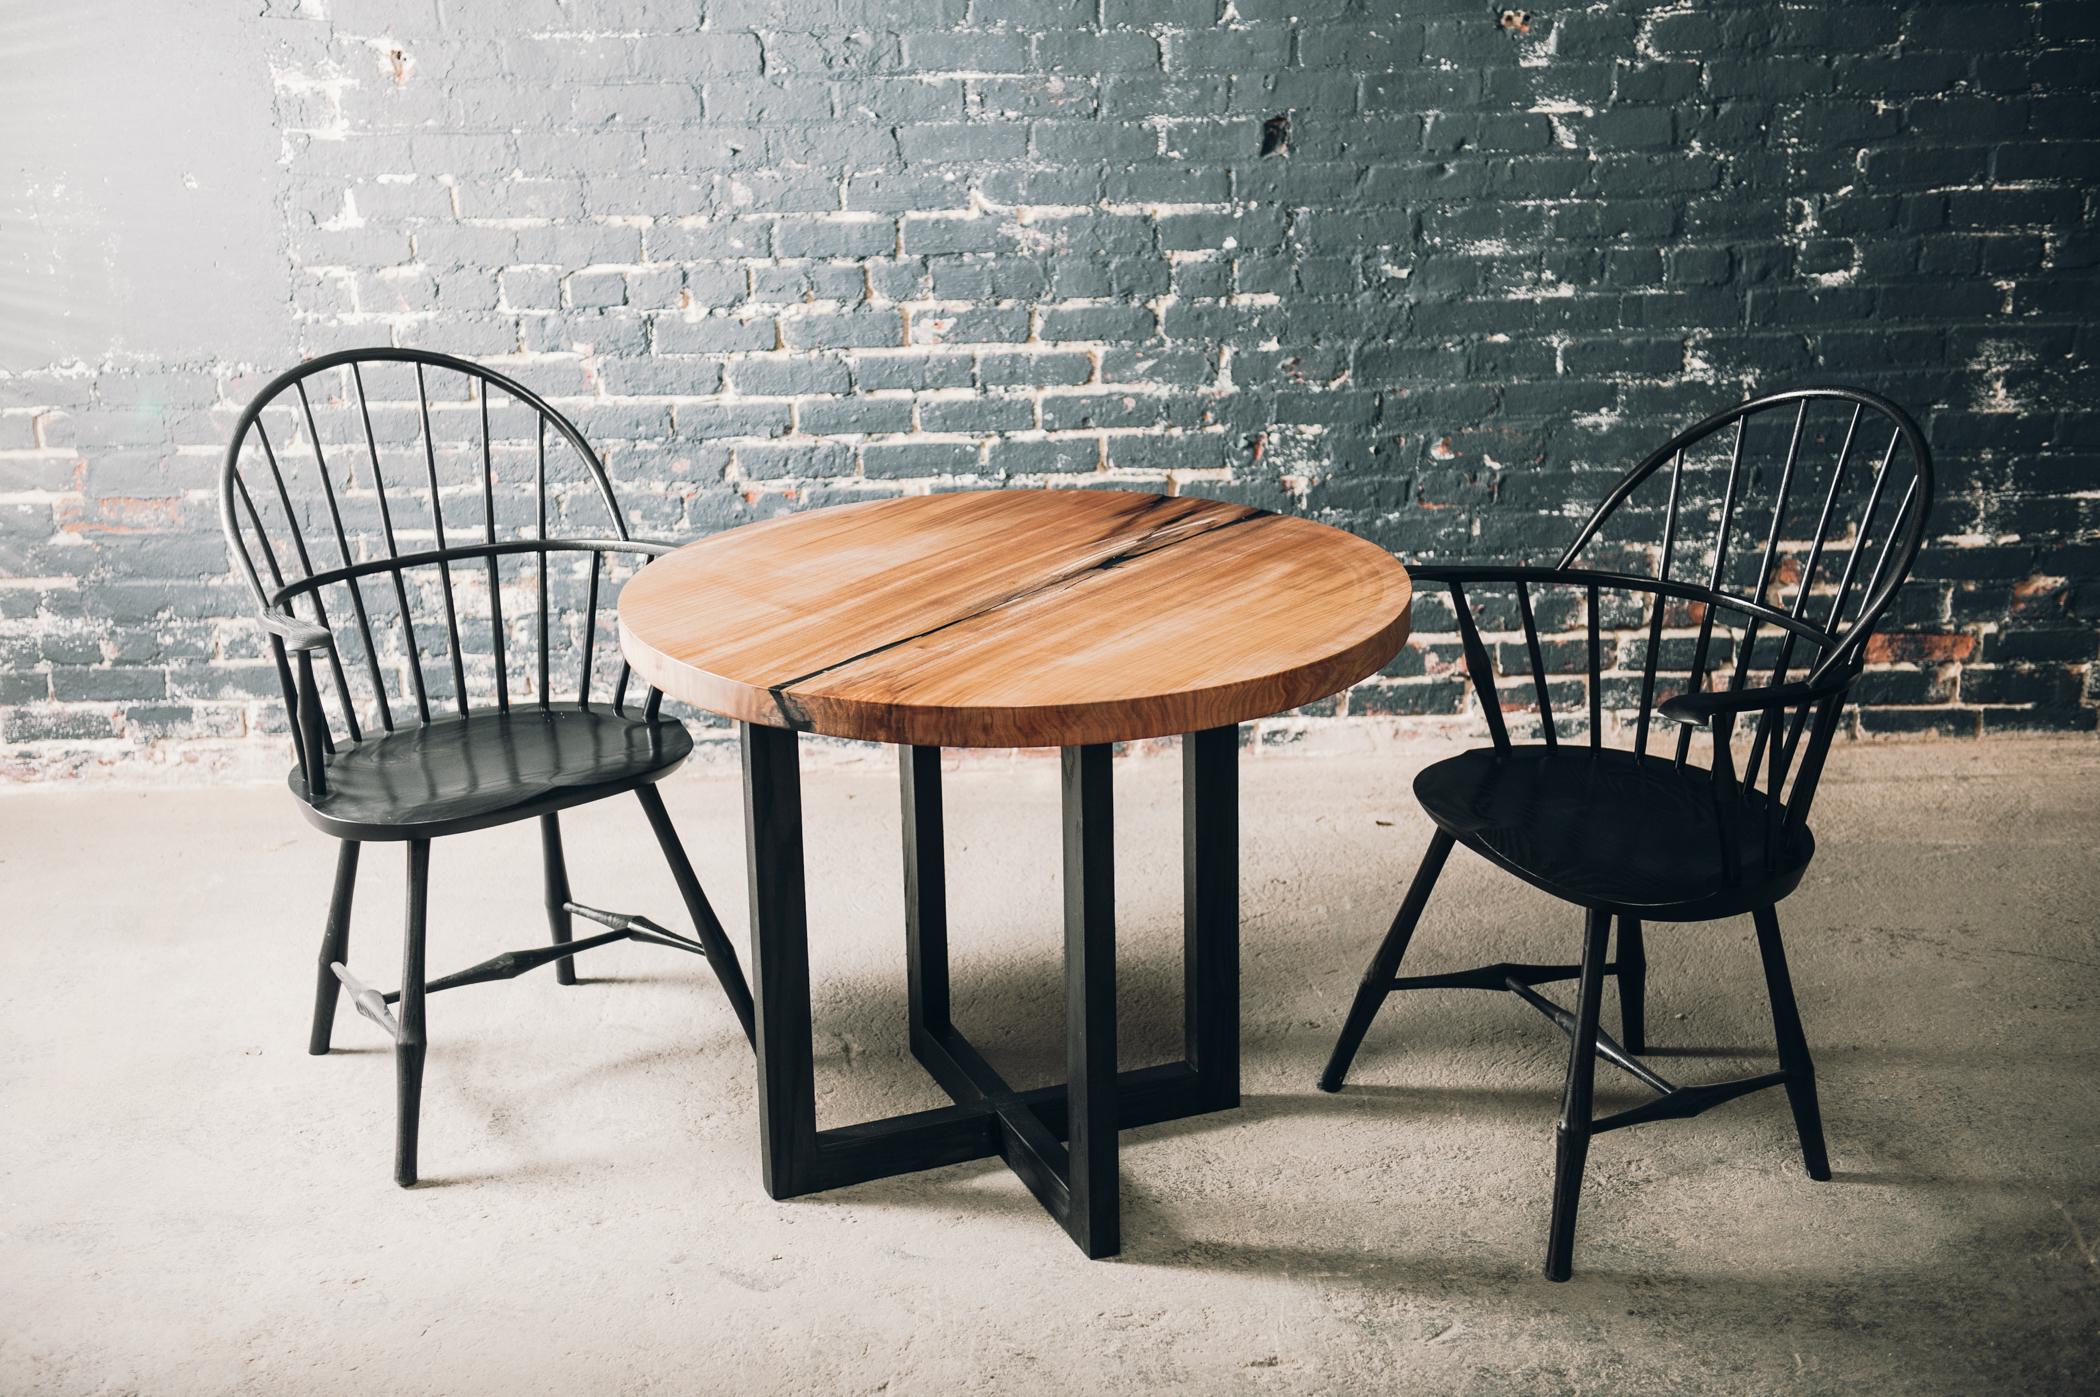 Pith_Round _Tables_DSC9868.jpg